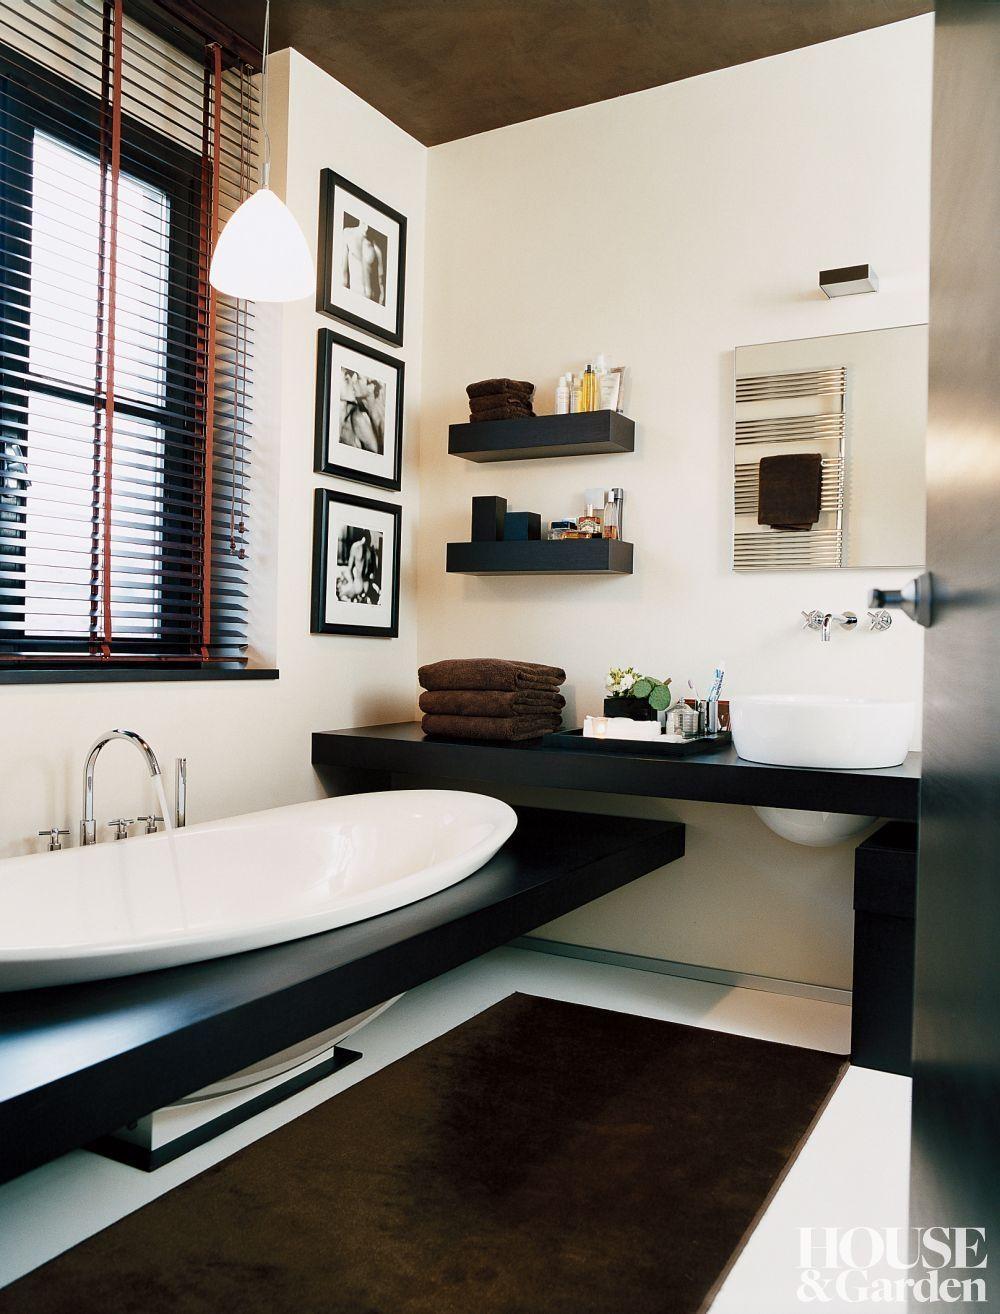 baño moderno de diseño italiano | decoracion interior | pinterest